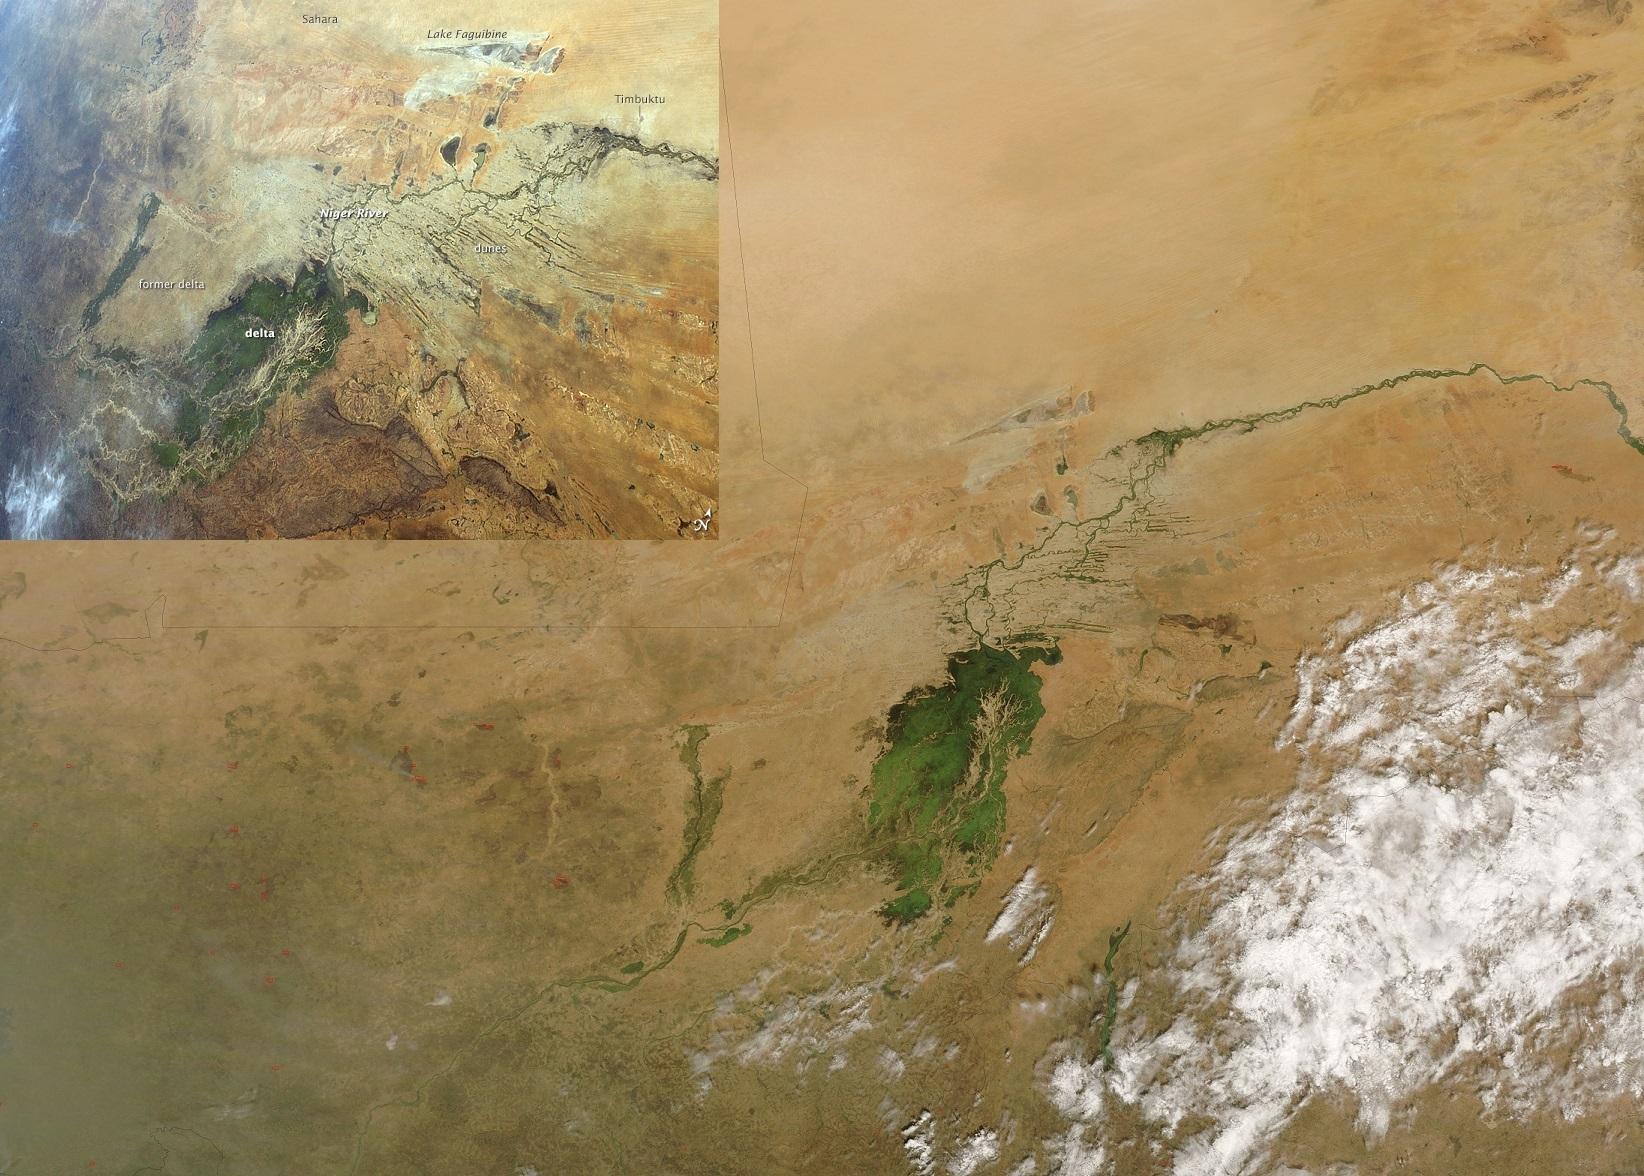 Vnitřní delta Nigeru (Zdroj: NASA)